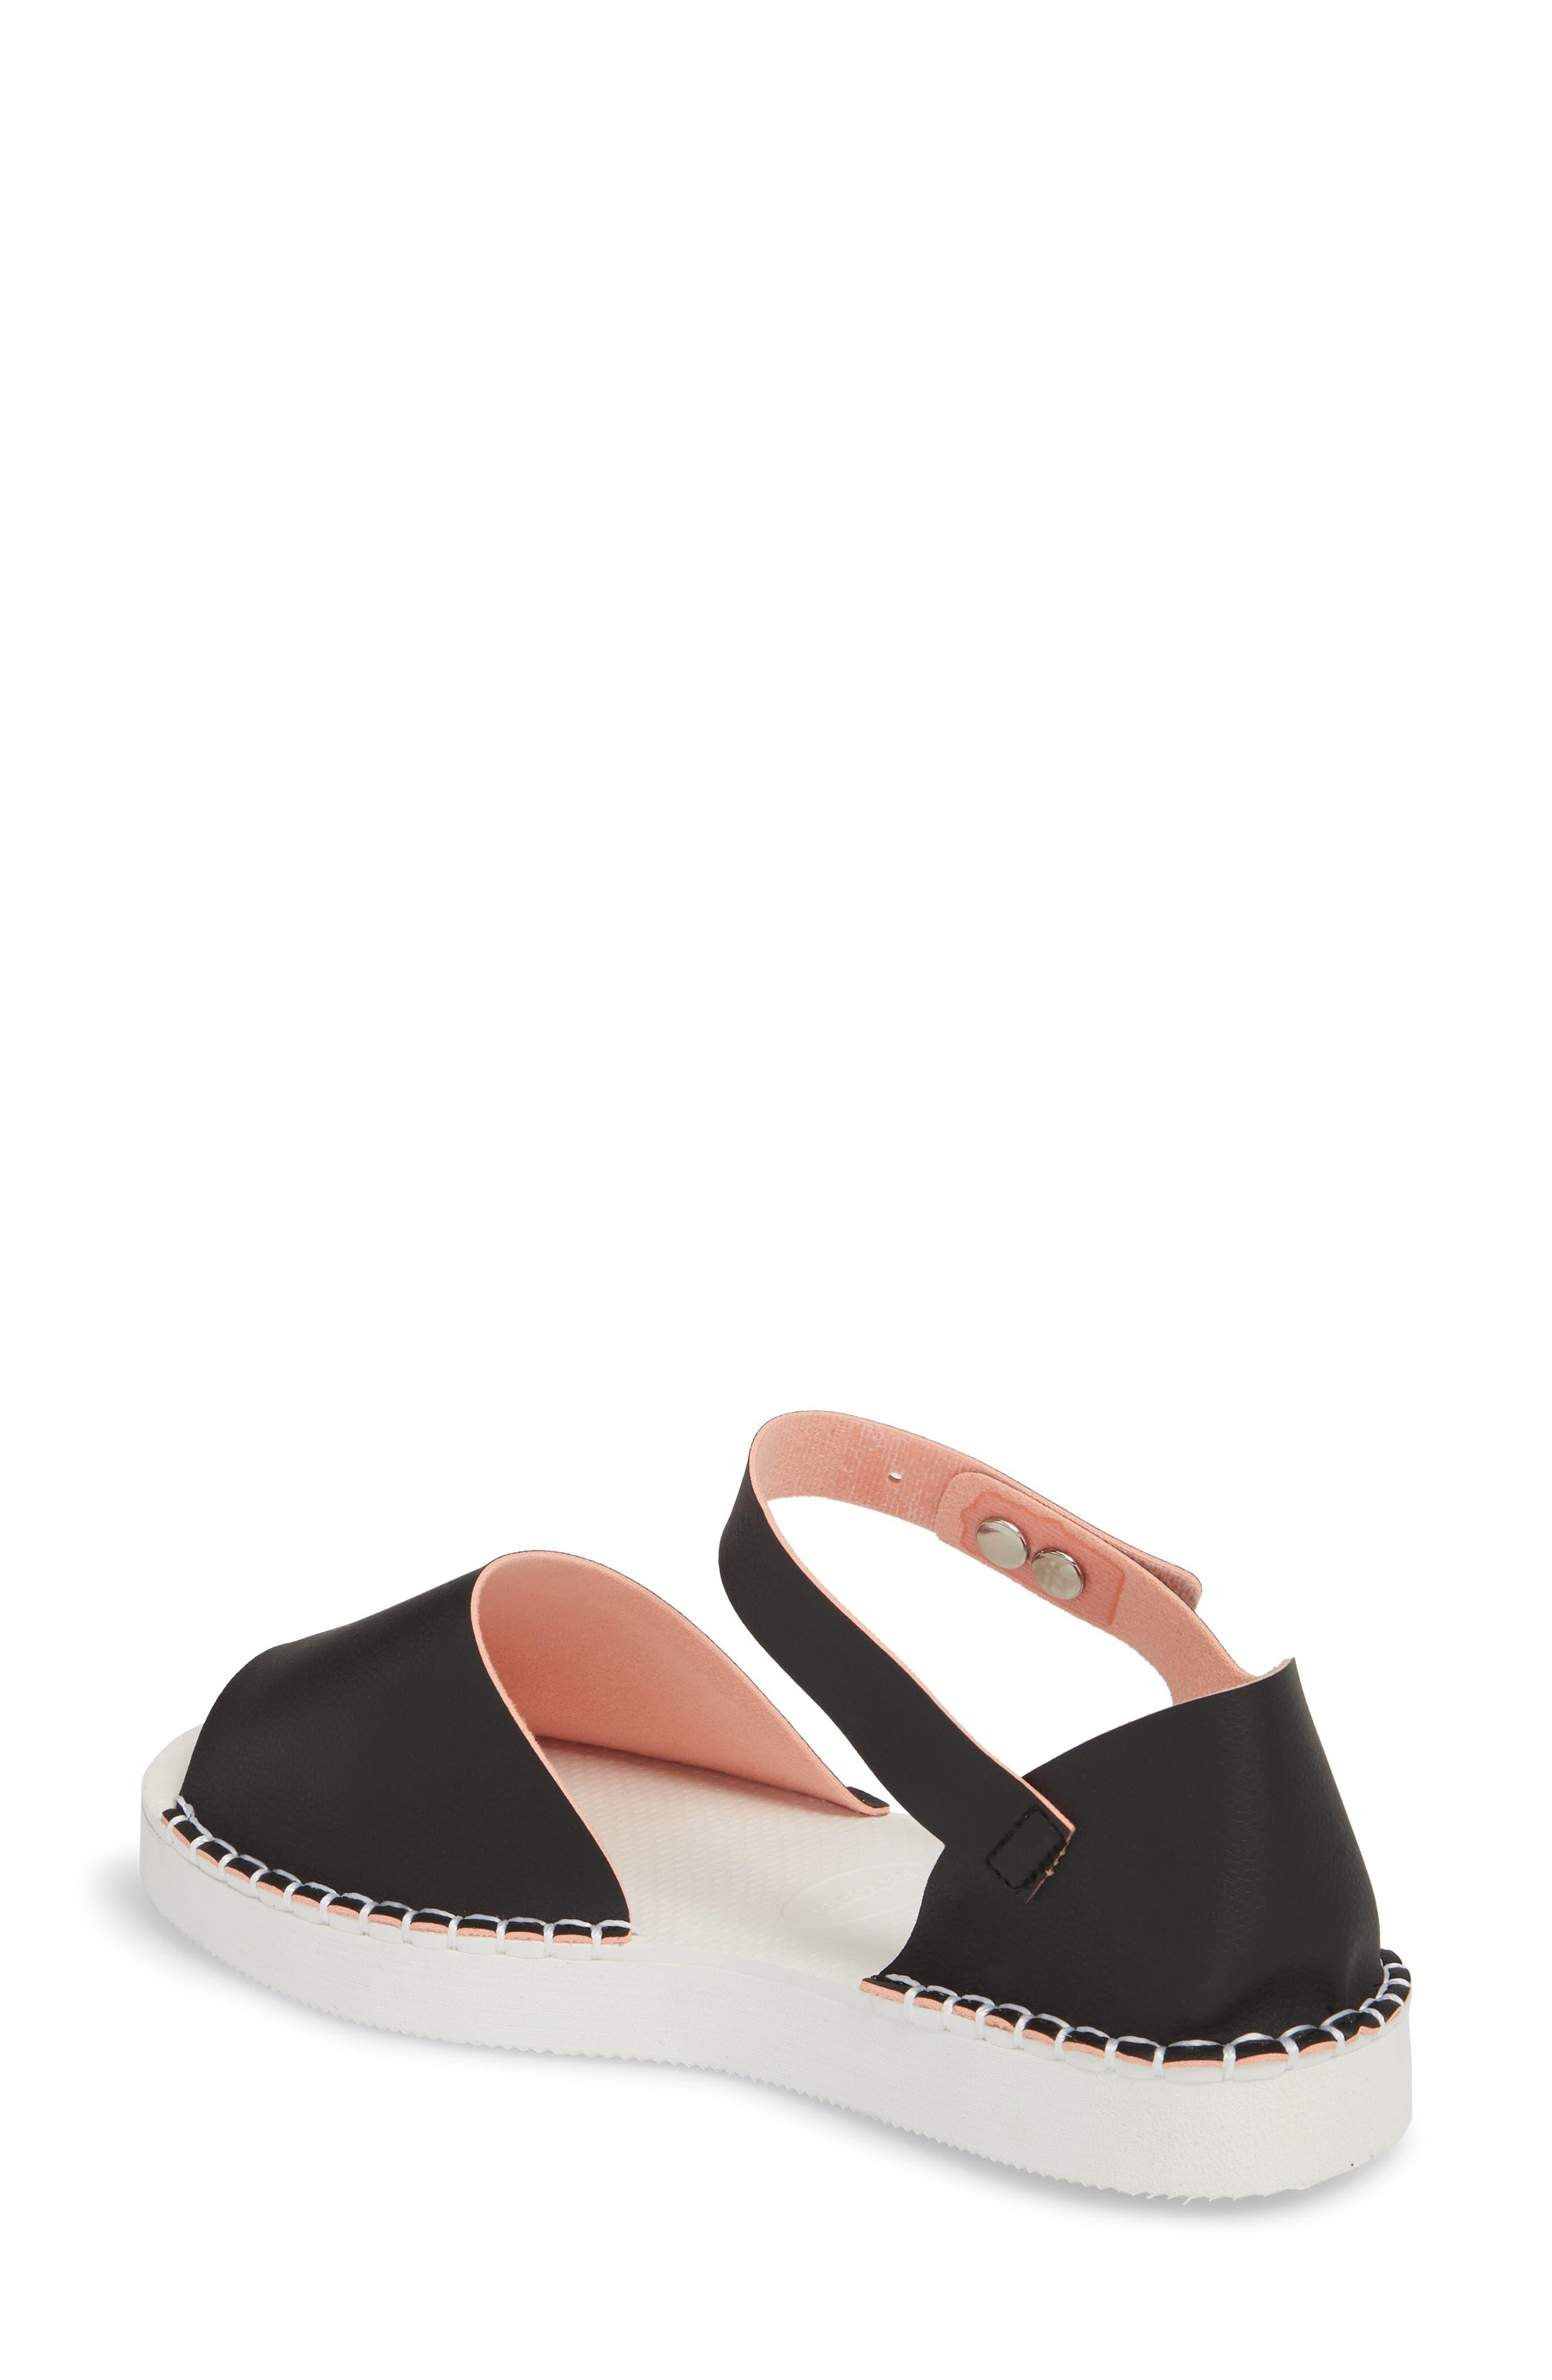 Flatform Fashion Sandal,                             Alternate thumbnail 2, color,                             BLACK/ PINK